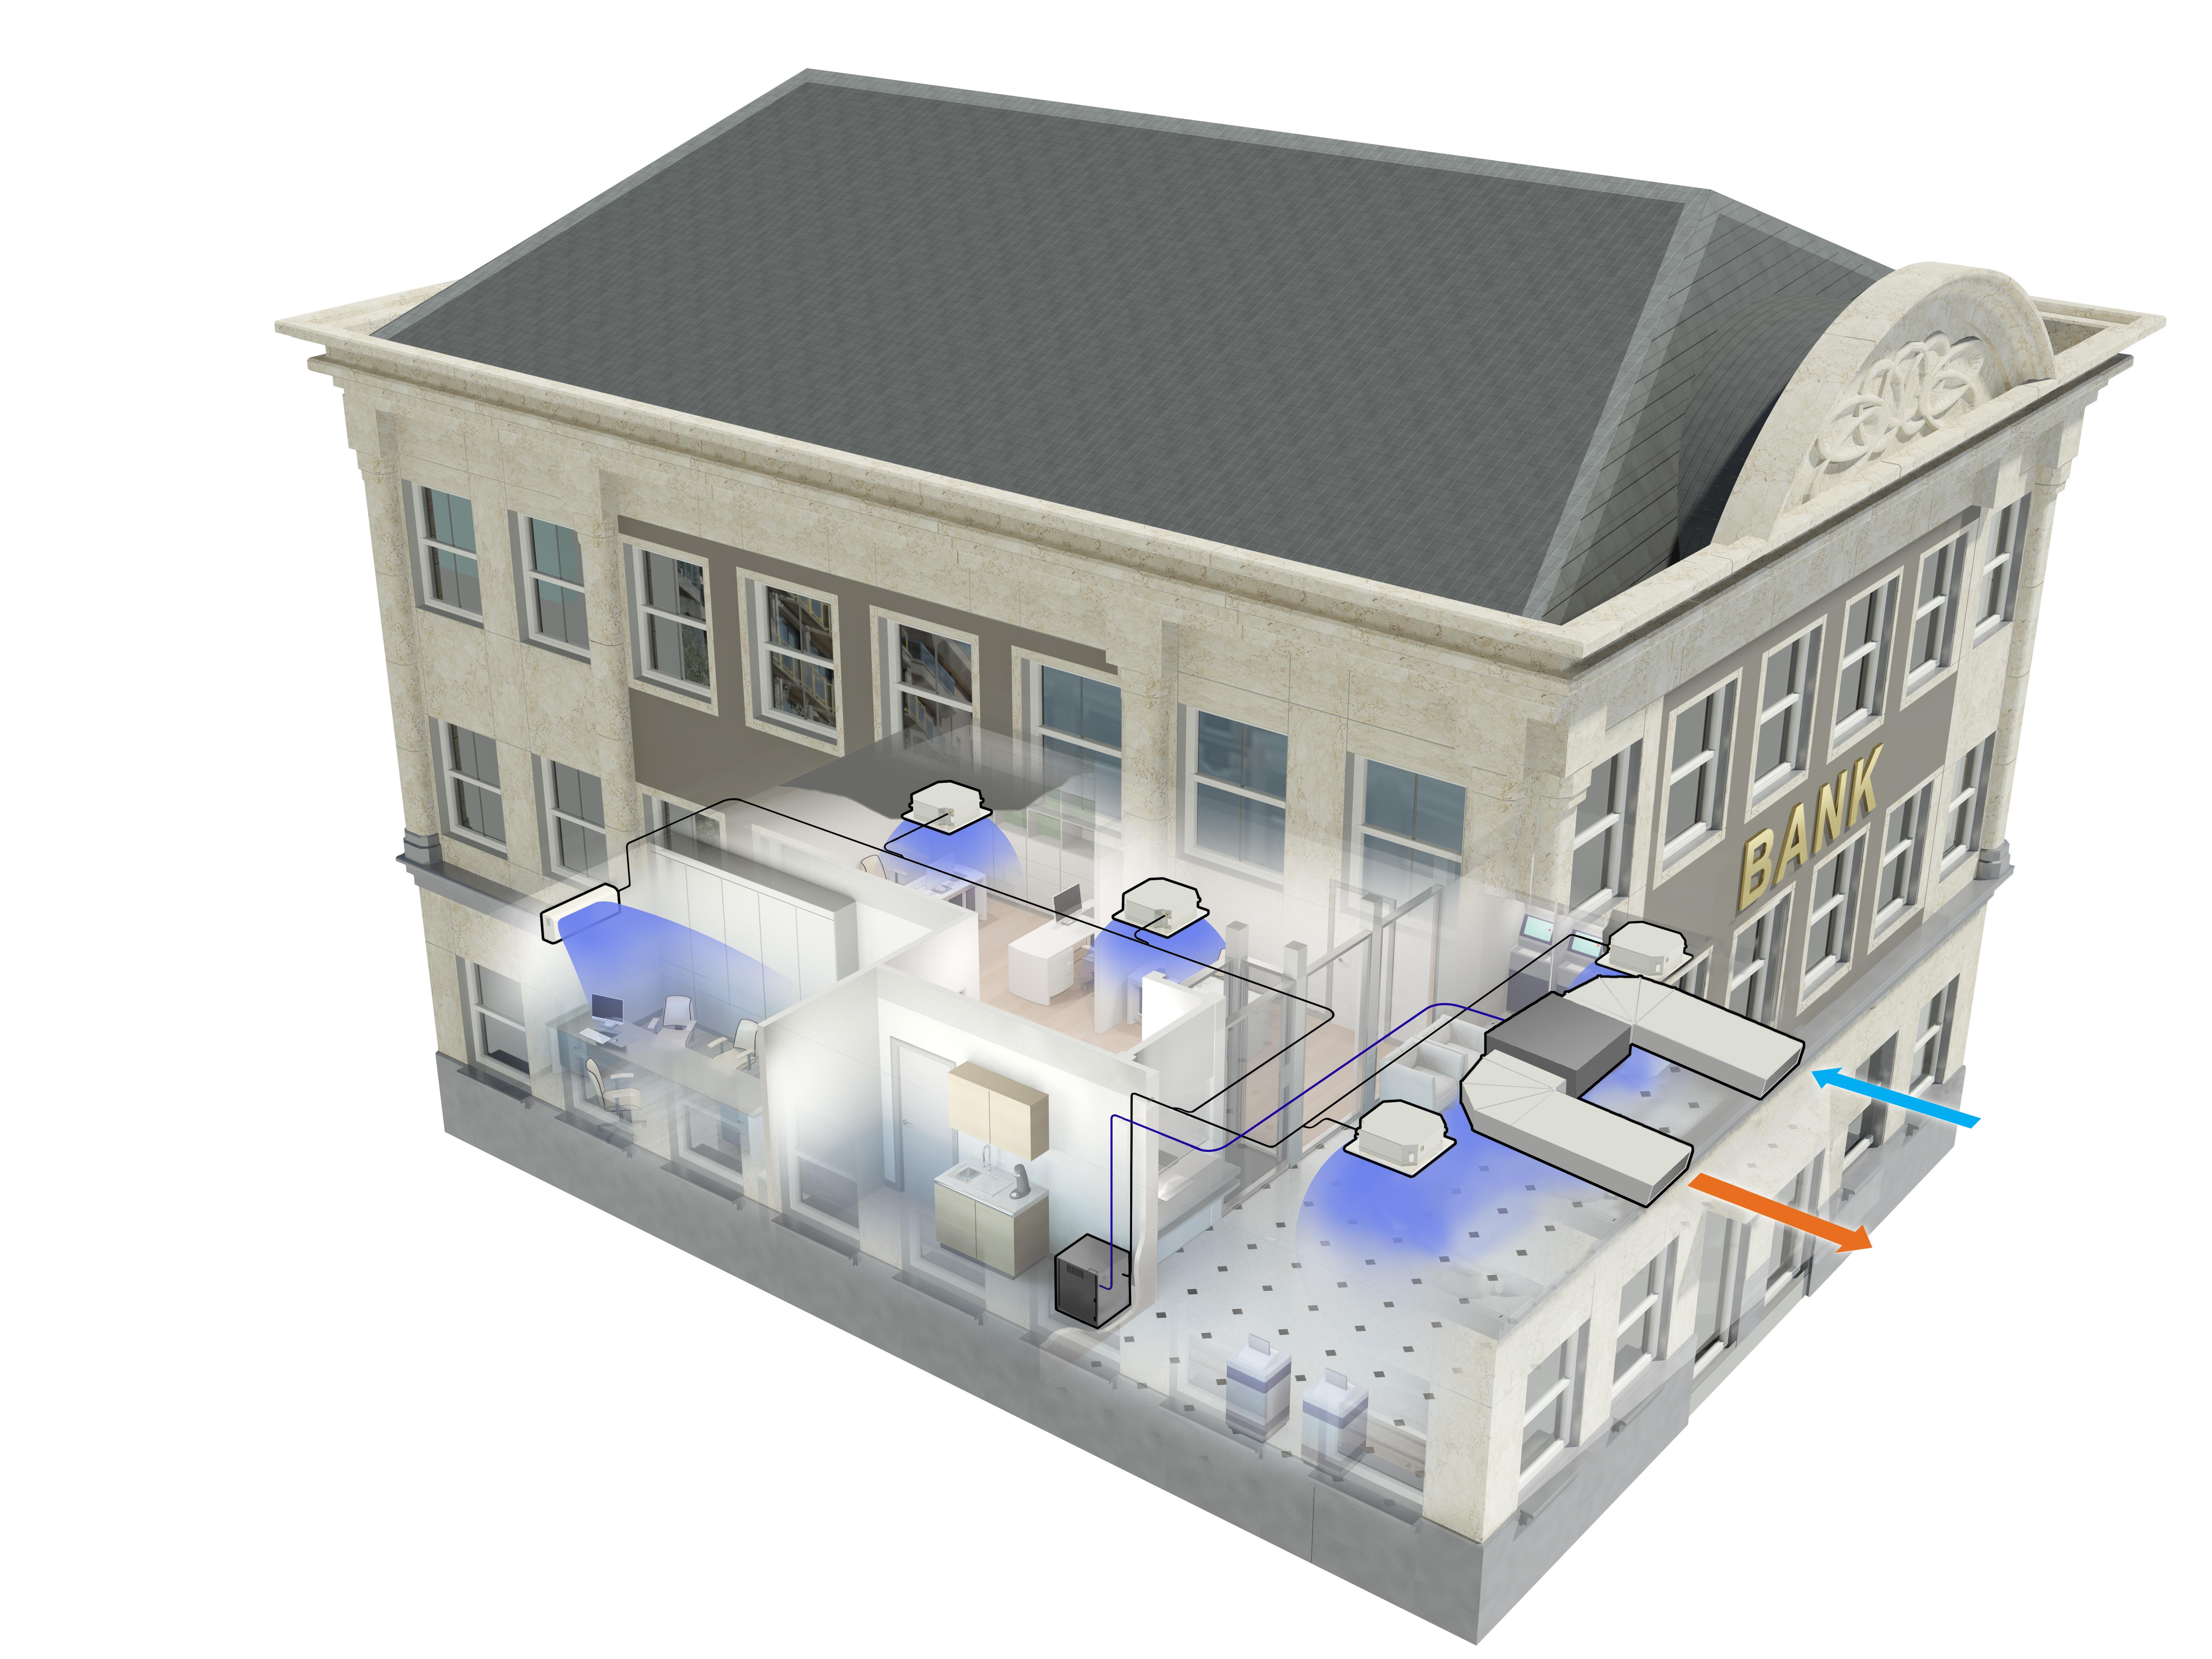 Vrv indoor de daikin la climatizaci n invisible e ficiencia for Aire acondicionado aparato exterior